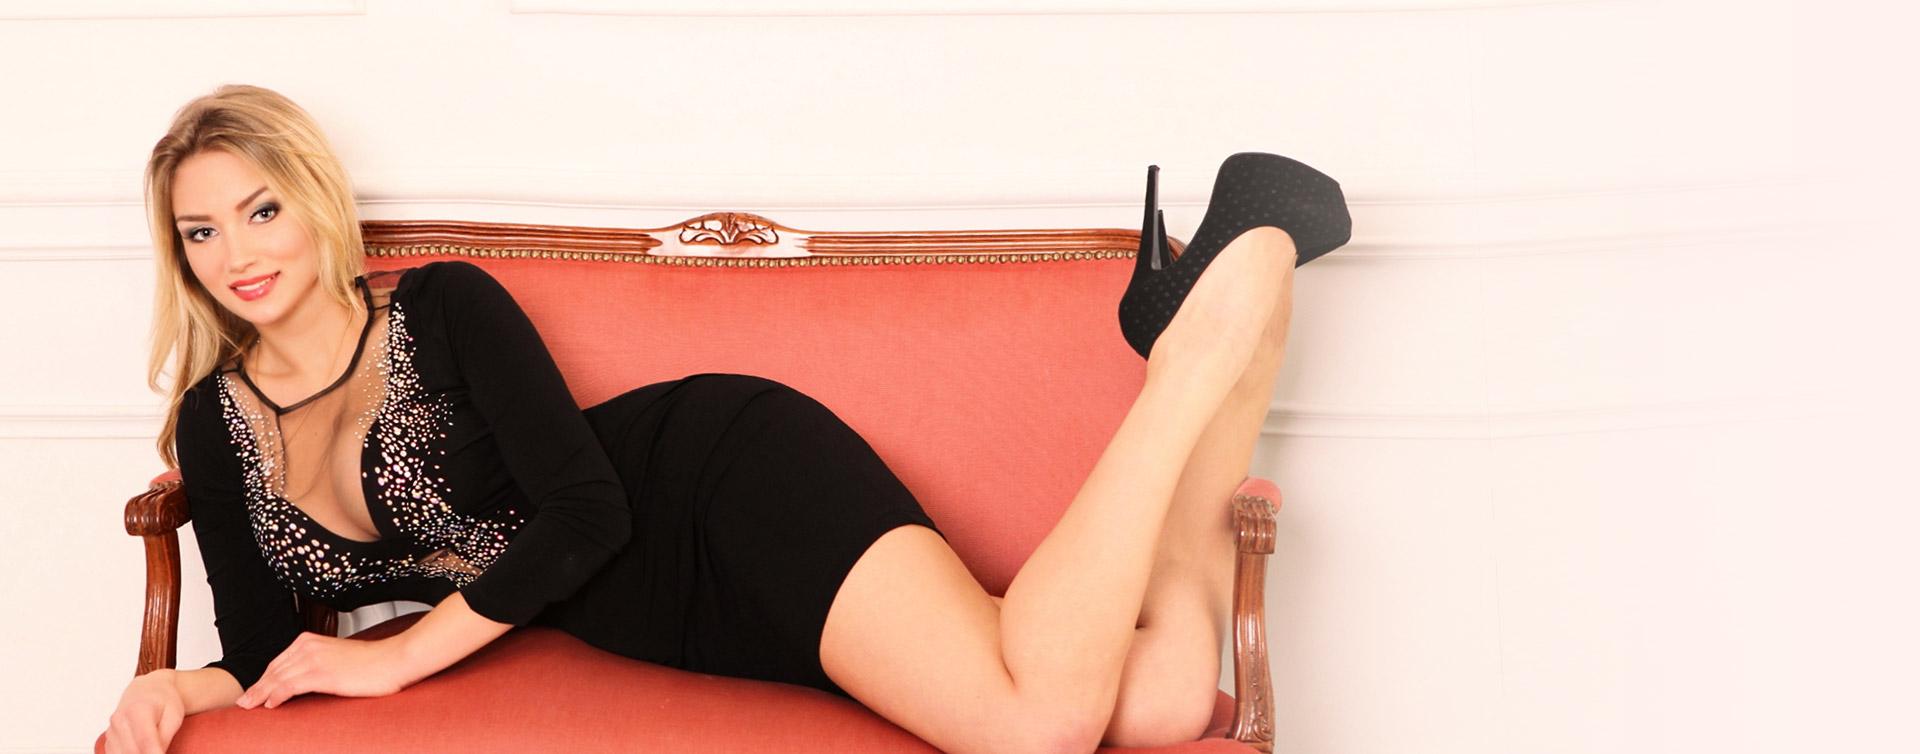 Date Belarus Womens and Girls - Elena's Models